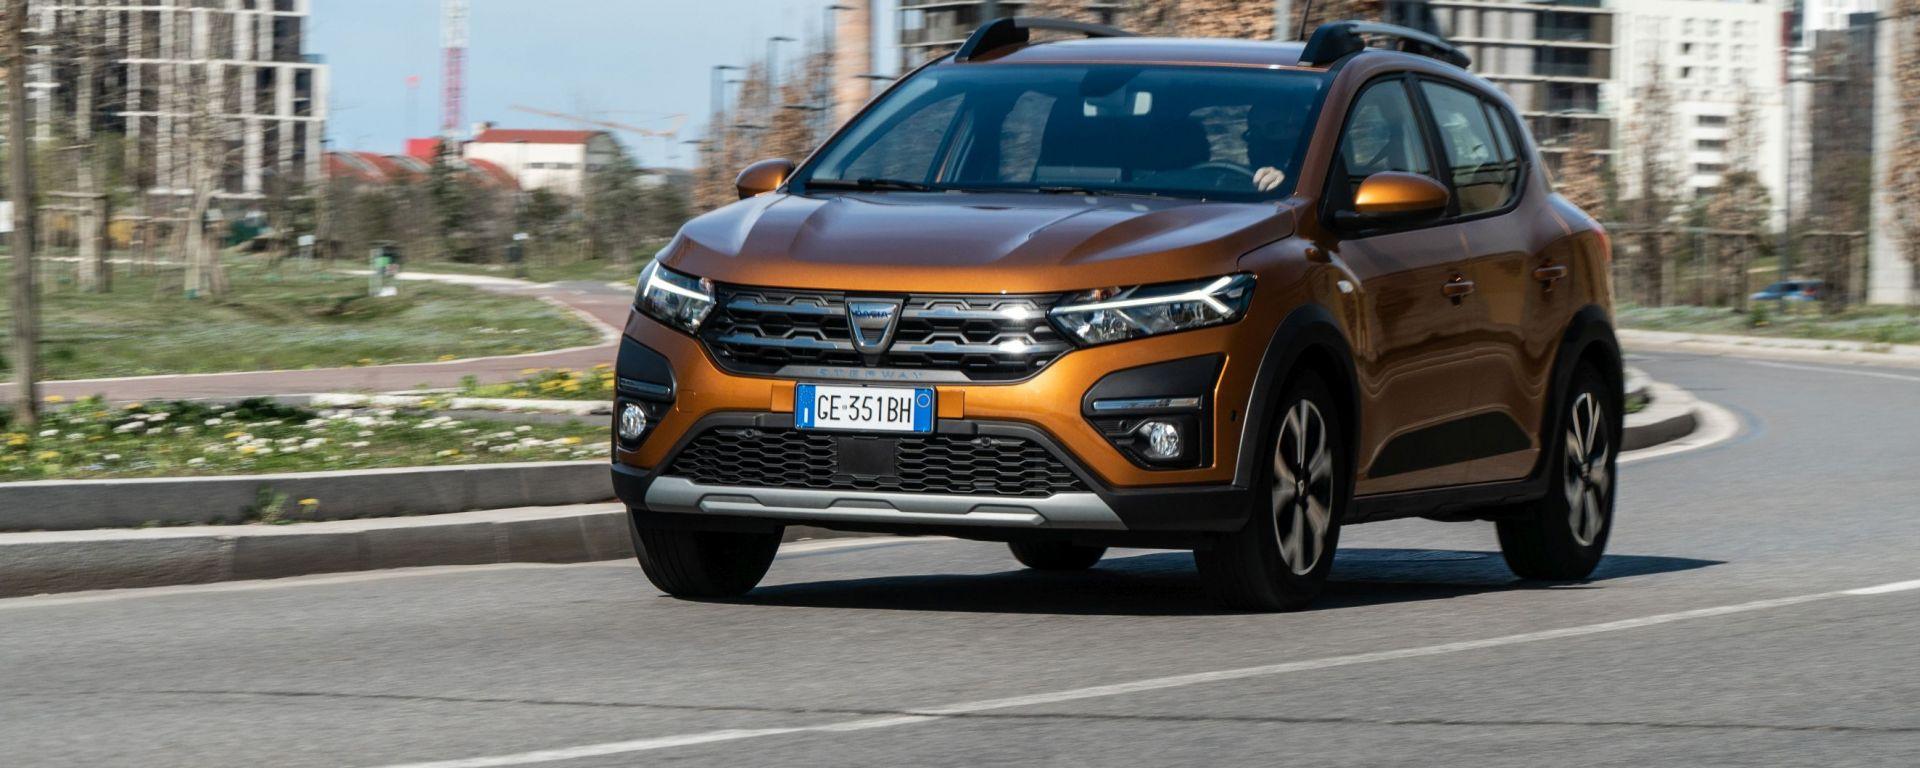 Dacia Sandero Comfort GPL: pratica ed economica